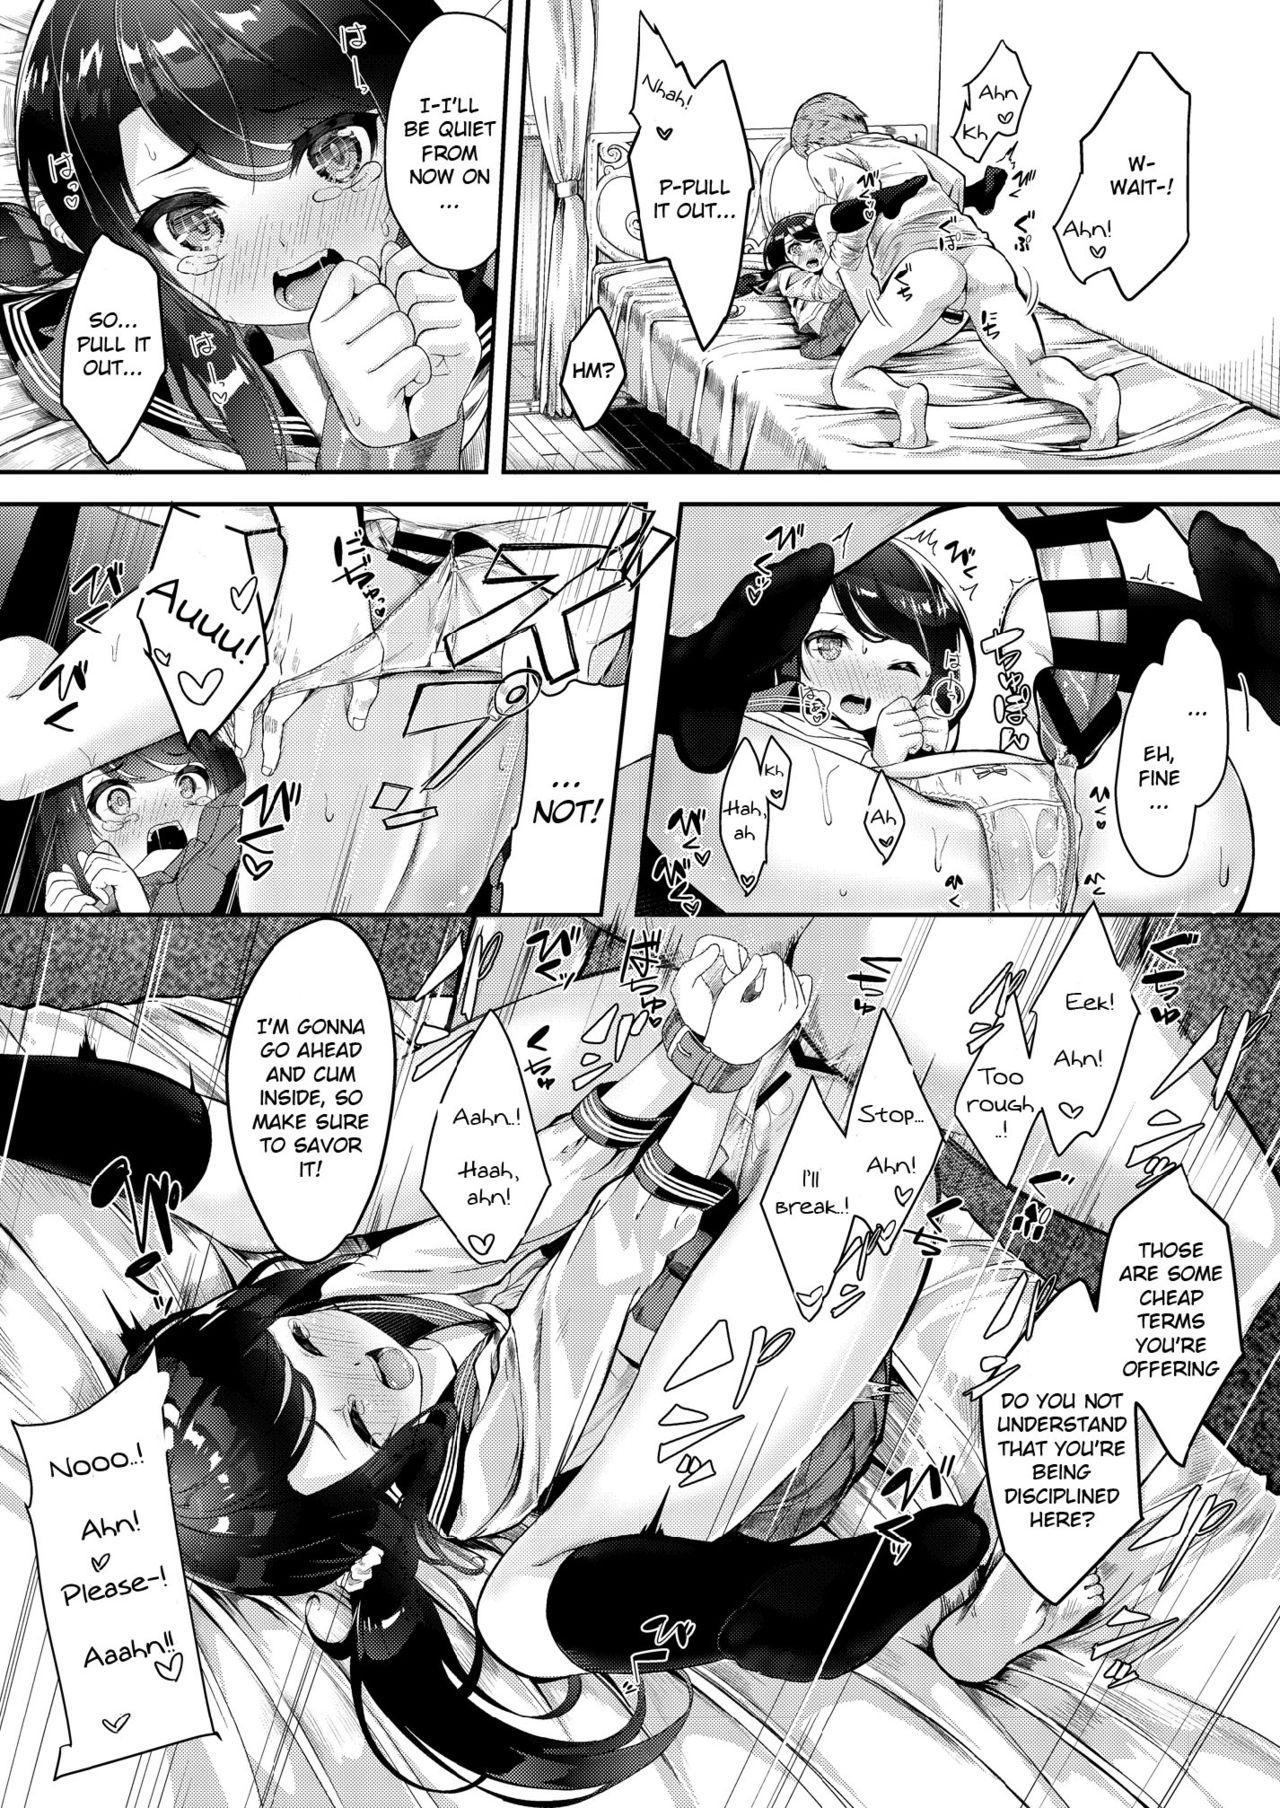 [Pleats Time (Nunnu)] Sister Breeding - Gimai Tsukimiya Setsuna Oshioki Ecchi Hen | Sister Breeding - Punishment Sex Edition with Step-sister Tsukimiya Setsuna [English] [Douzo Lad Translations] [Digital] 12